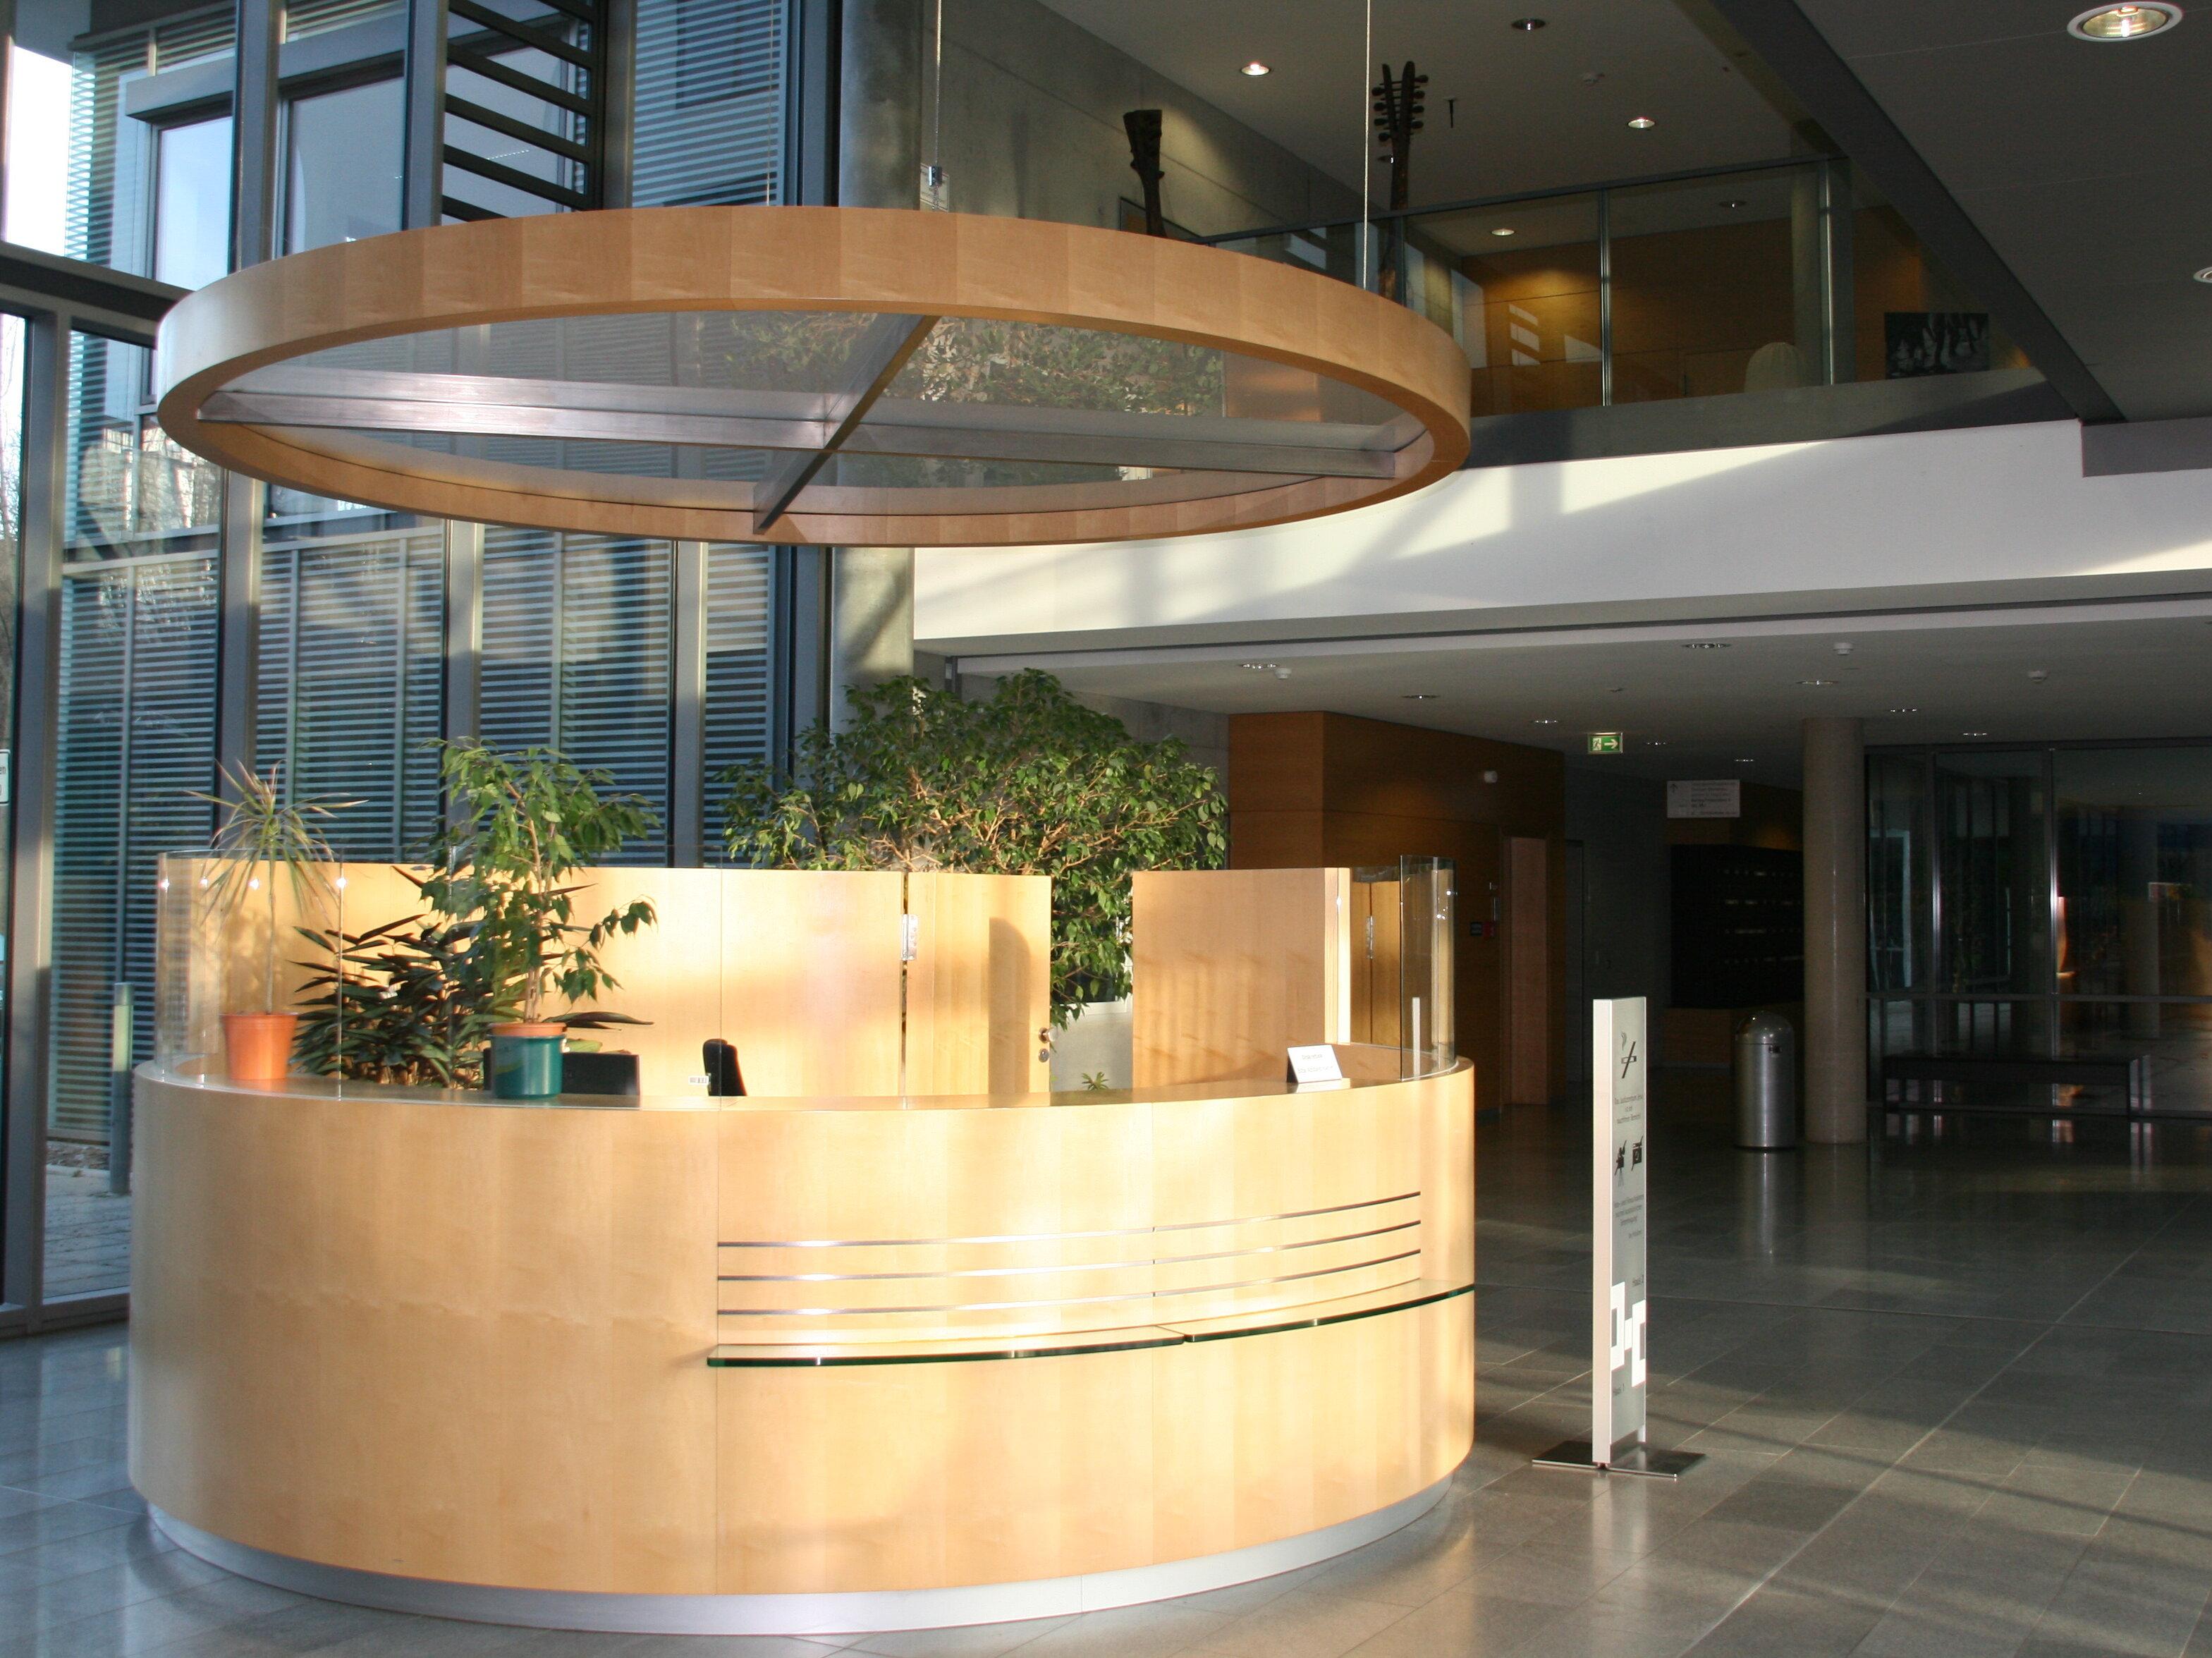 Bild: Foyer des Justizzentrums Jena